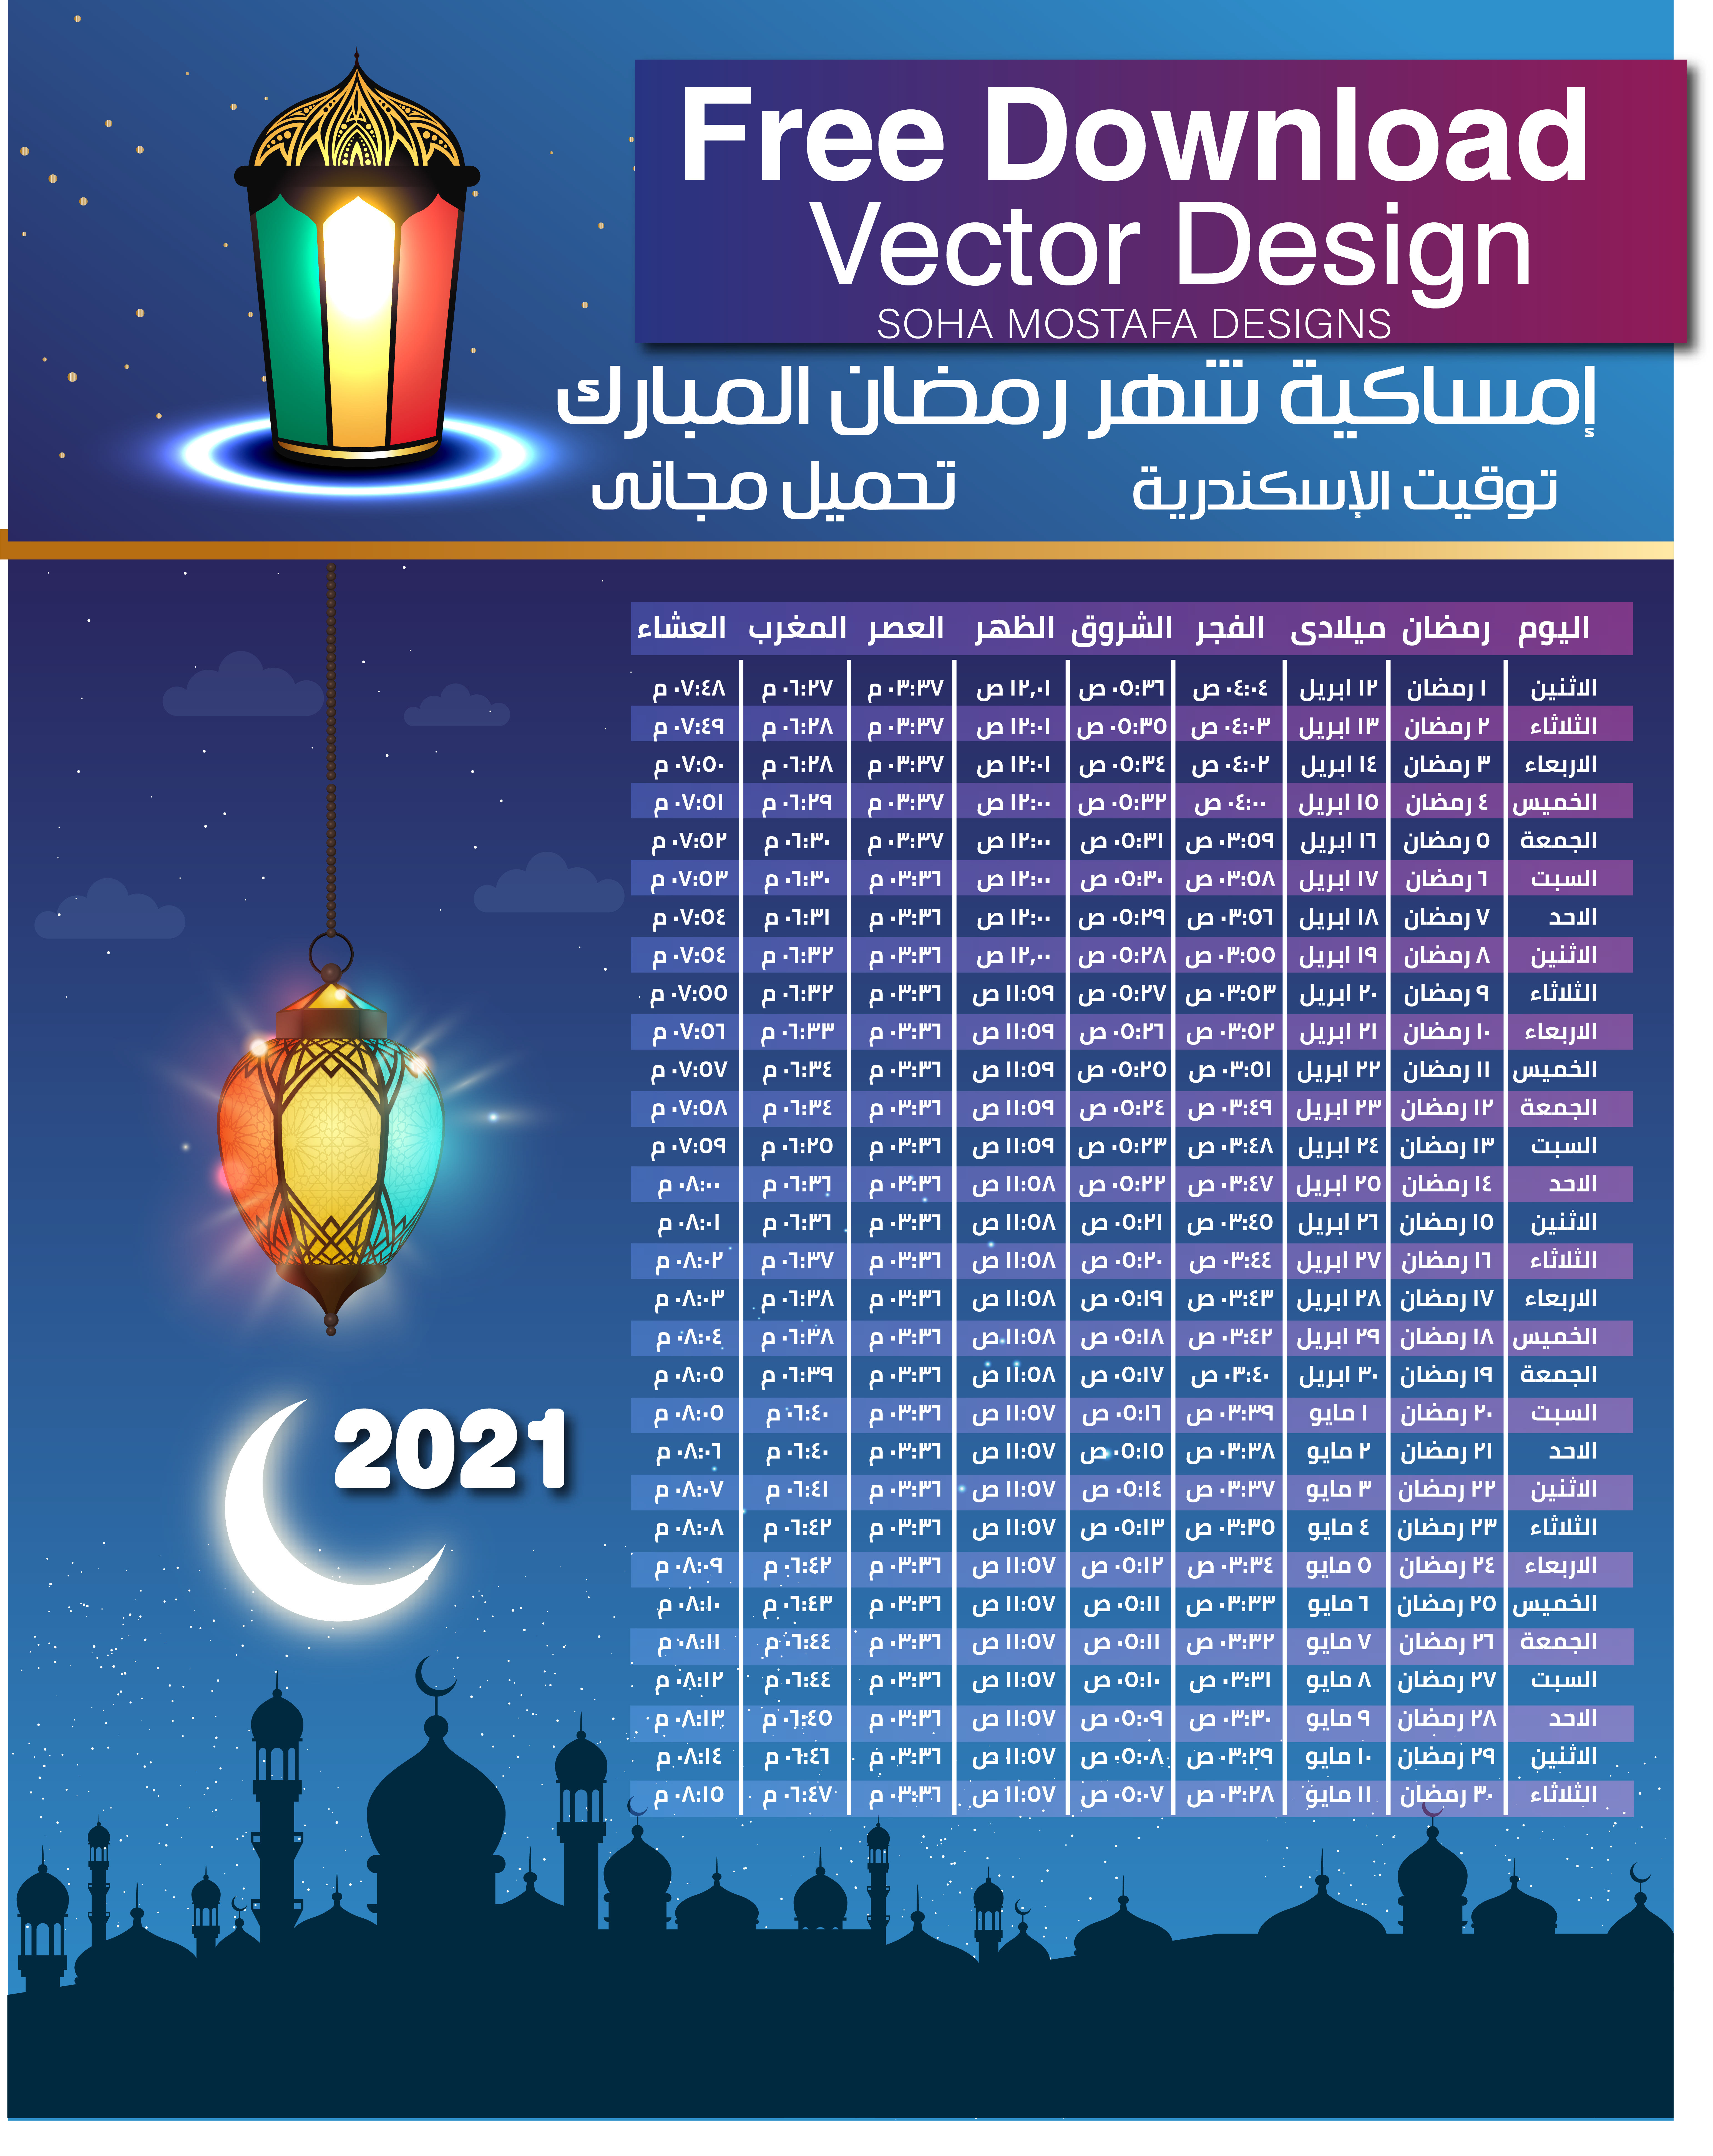 امساكية Projects Photos Videos Logos Illustrations And Branding On Behance